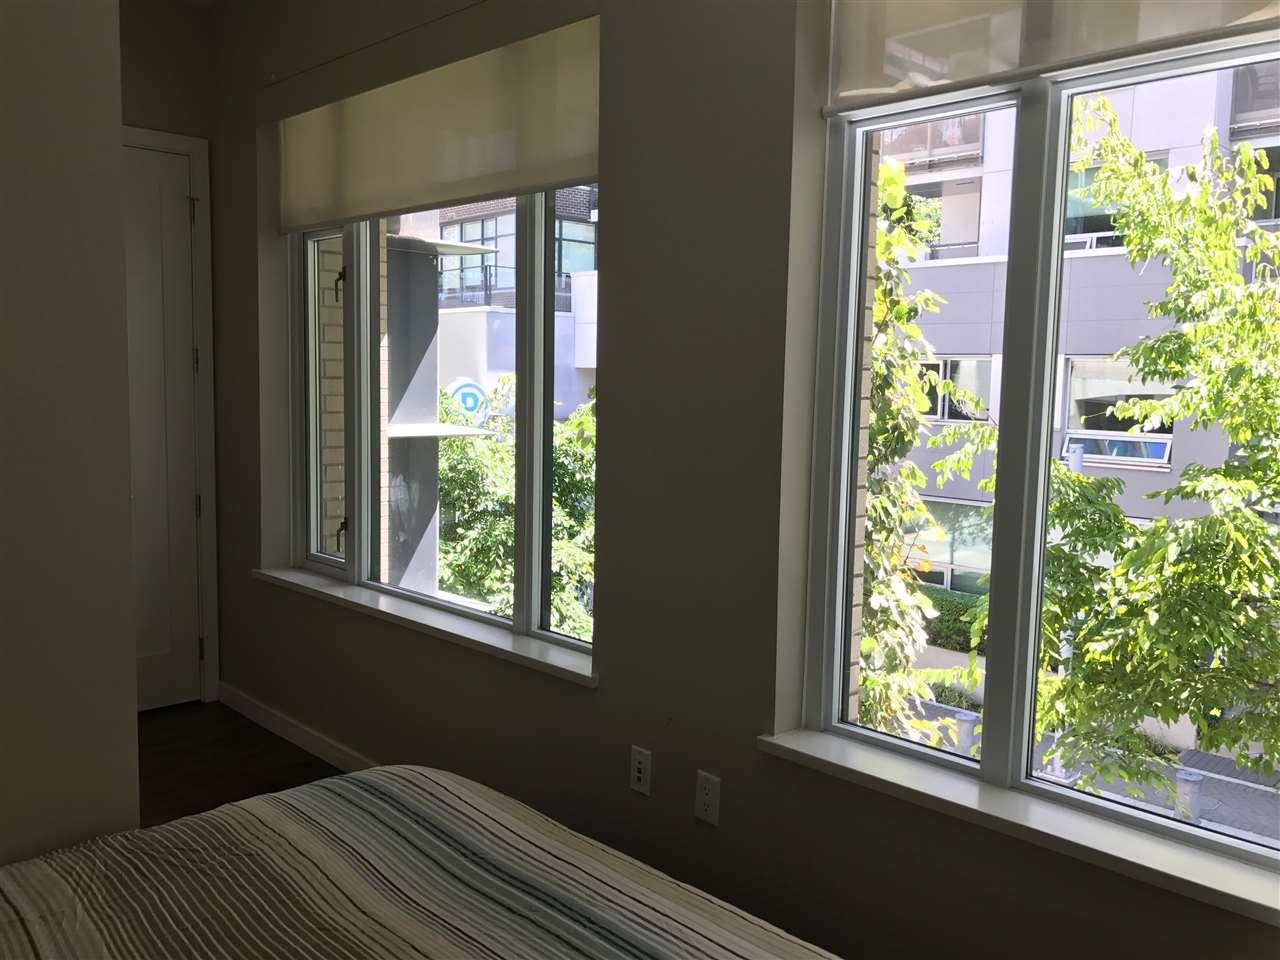 Condo Apartment at 21 77 WALTER HARDWICK AVENUE, Unit 21, Vancouver West, British Columbia. Image 6